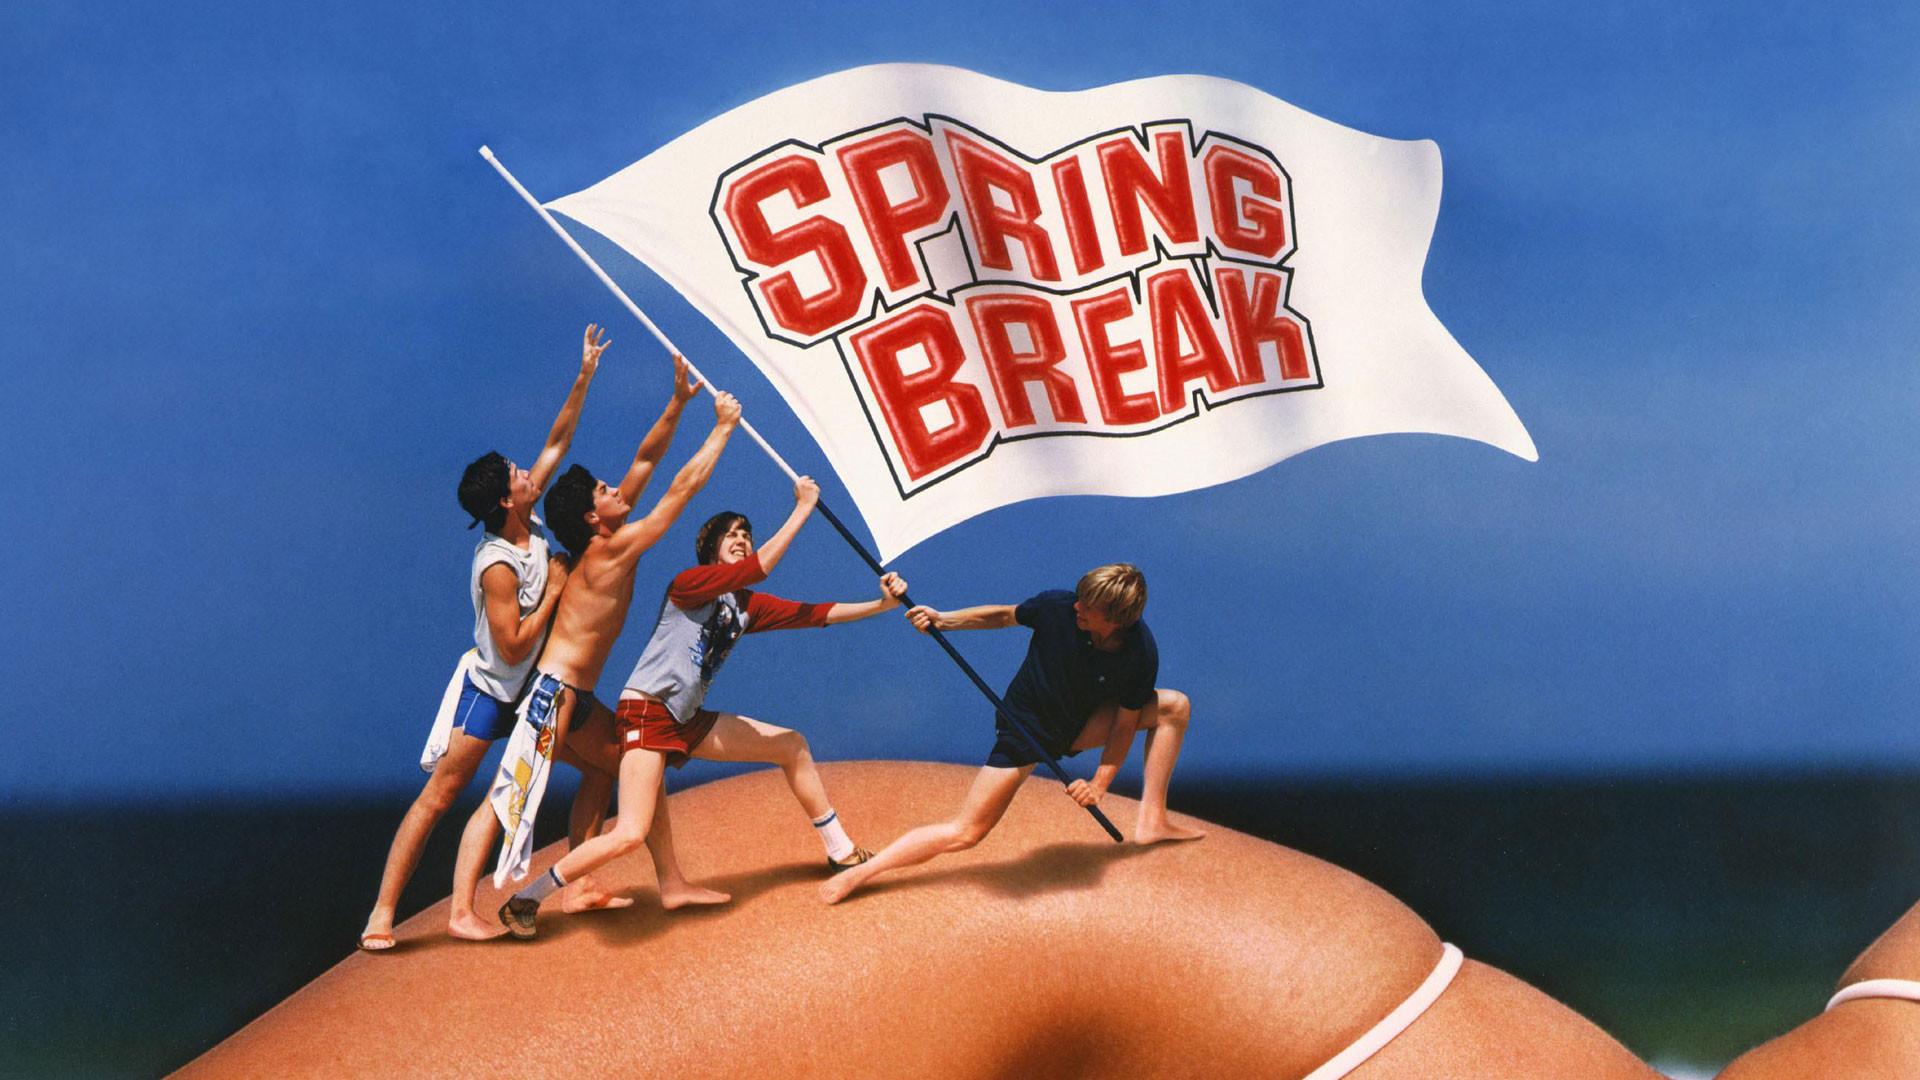 Spring Break wallpaper Spring Break hd wallpaper background desktop 1920x1080